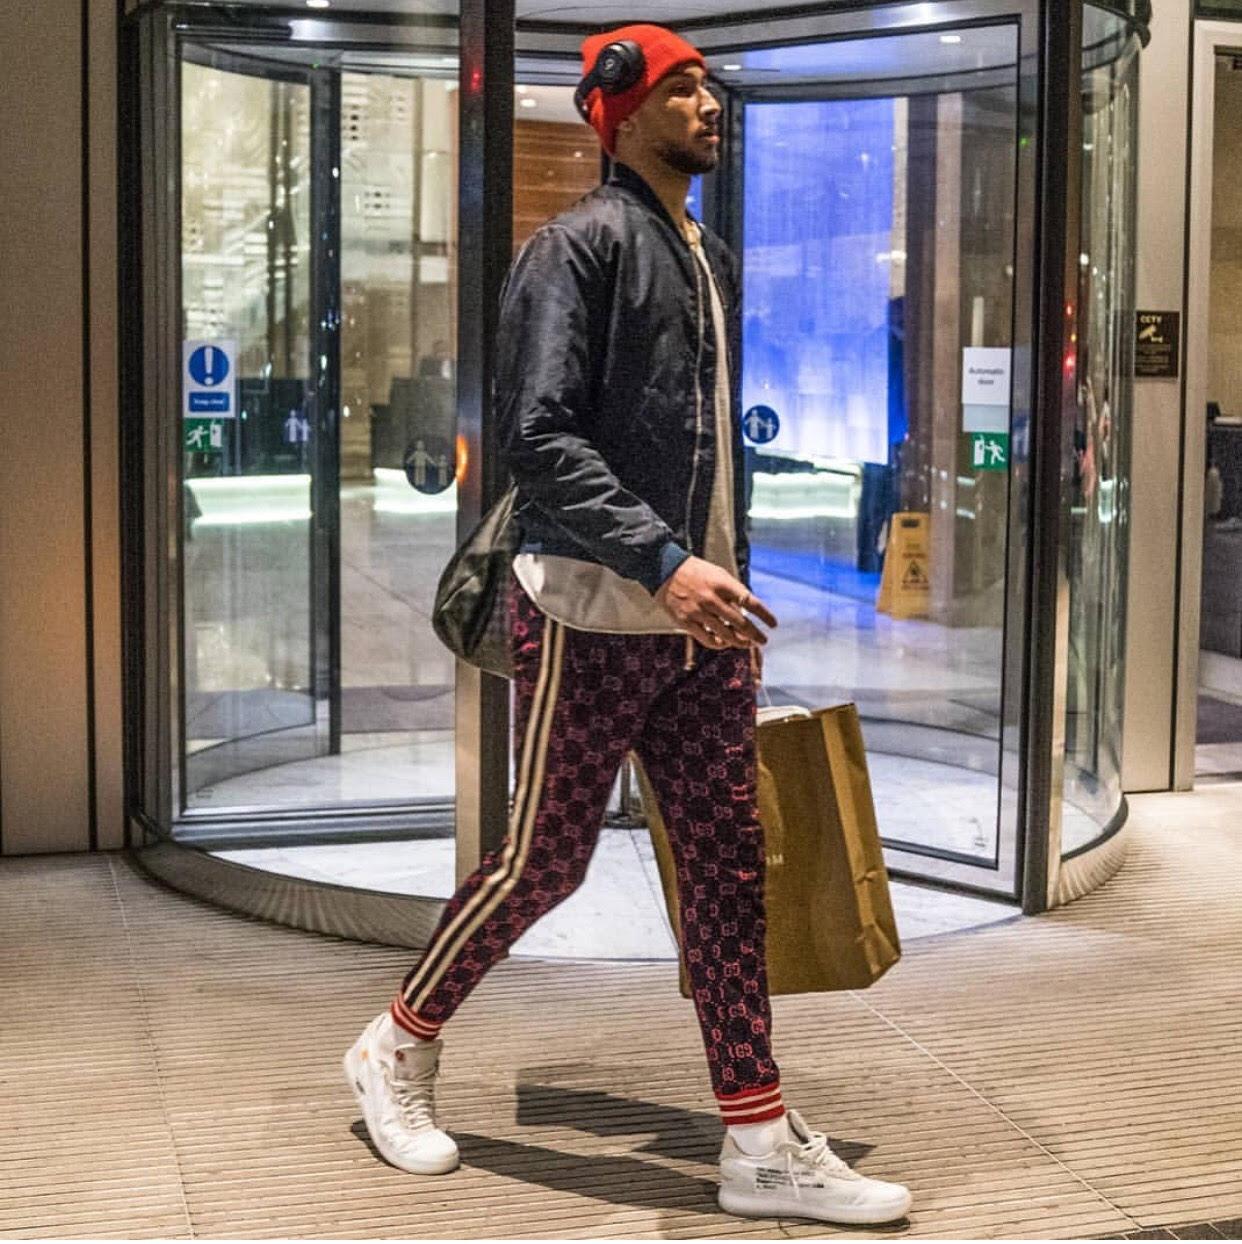 Ben Simmons' NBA London Game Gucci GG Jacquard Jogging Pant